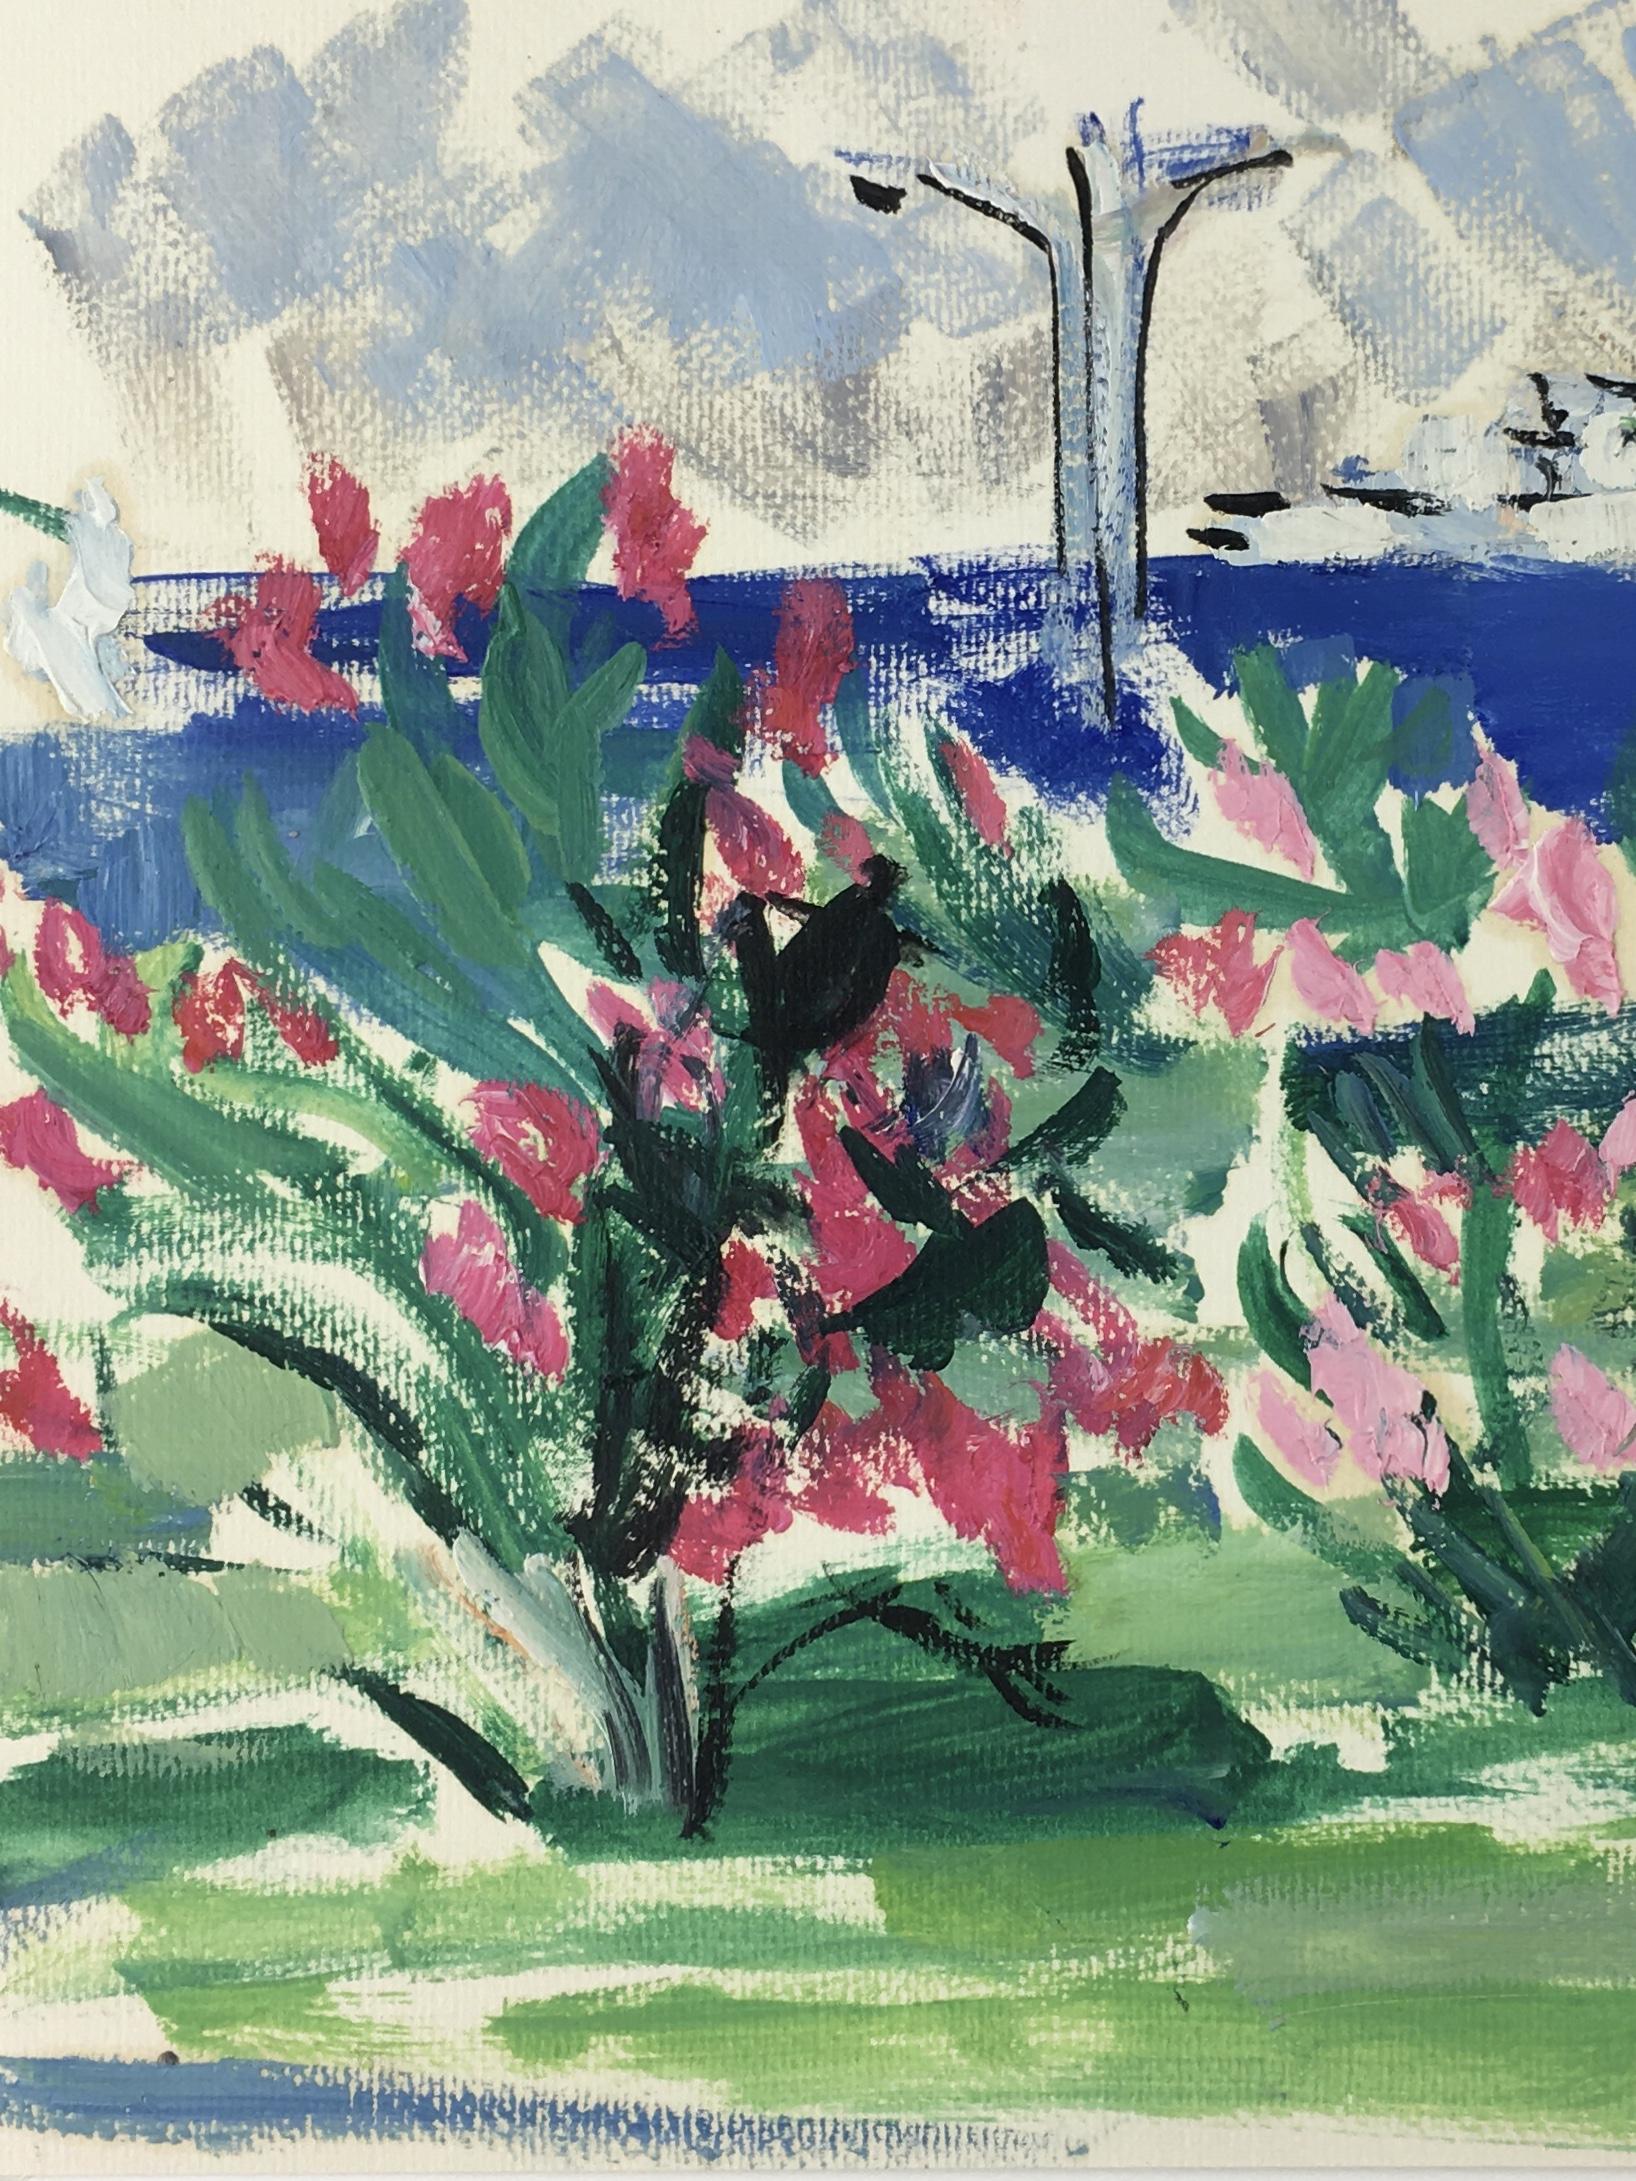 Seascapes Original Art - Among Blooms, Odette Bruriaux 1923-03), 1960